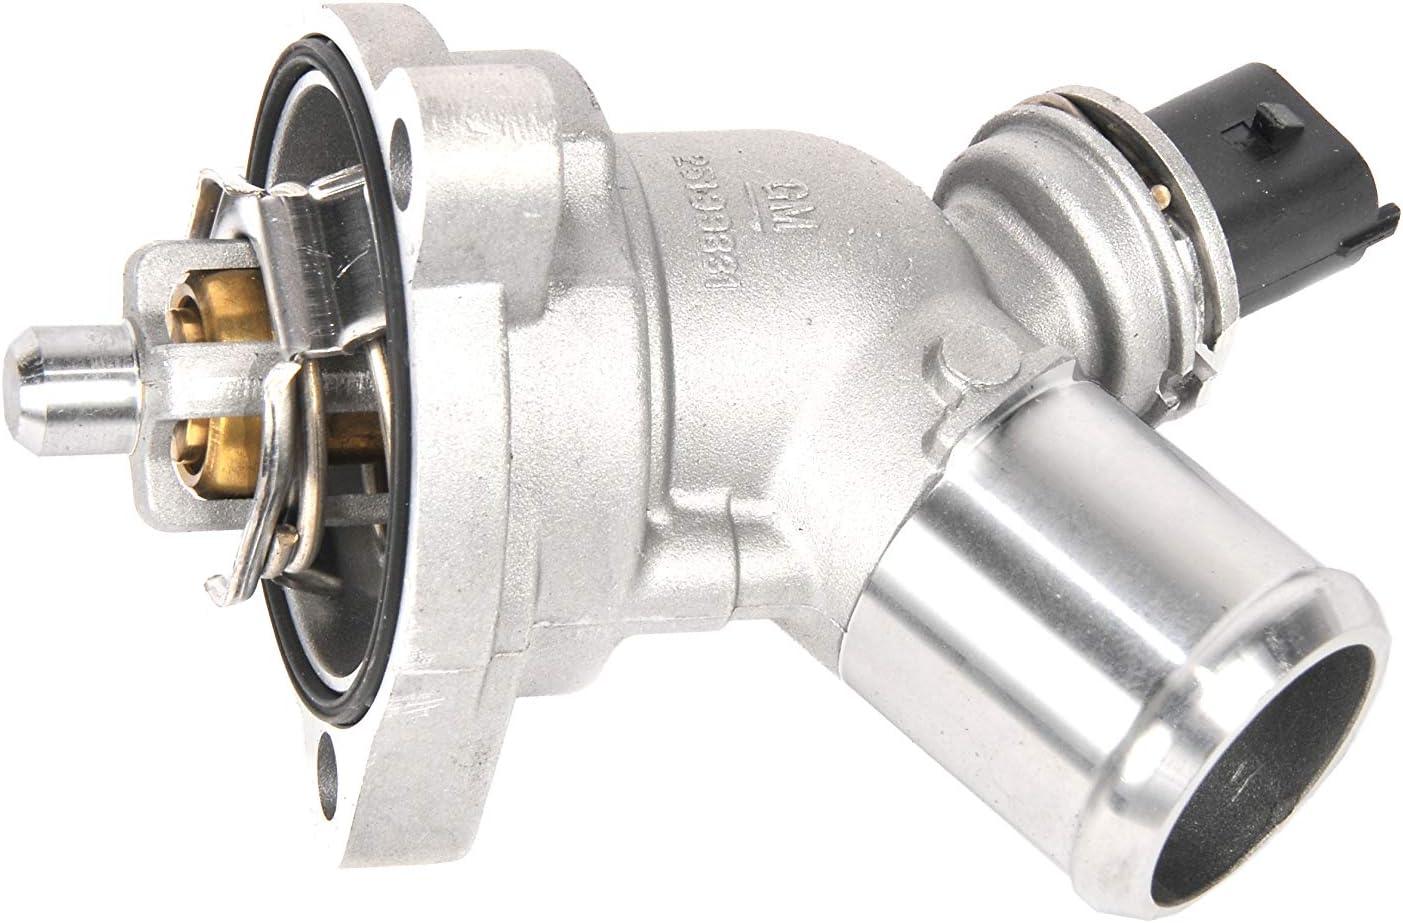 New OEM Thermostat - 2013-2015 Spark 1.2L 25199831 w//Housing /& Sensor